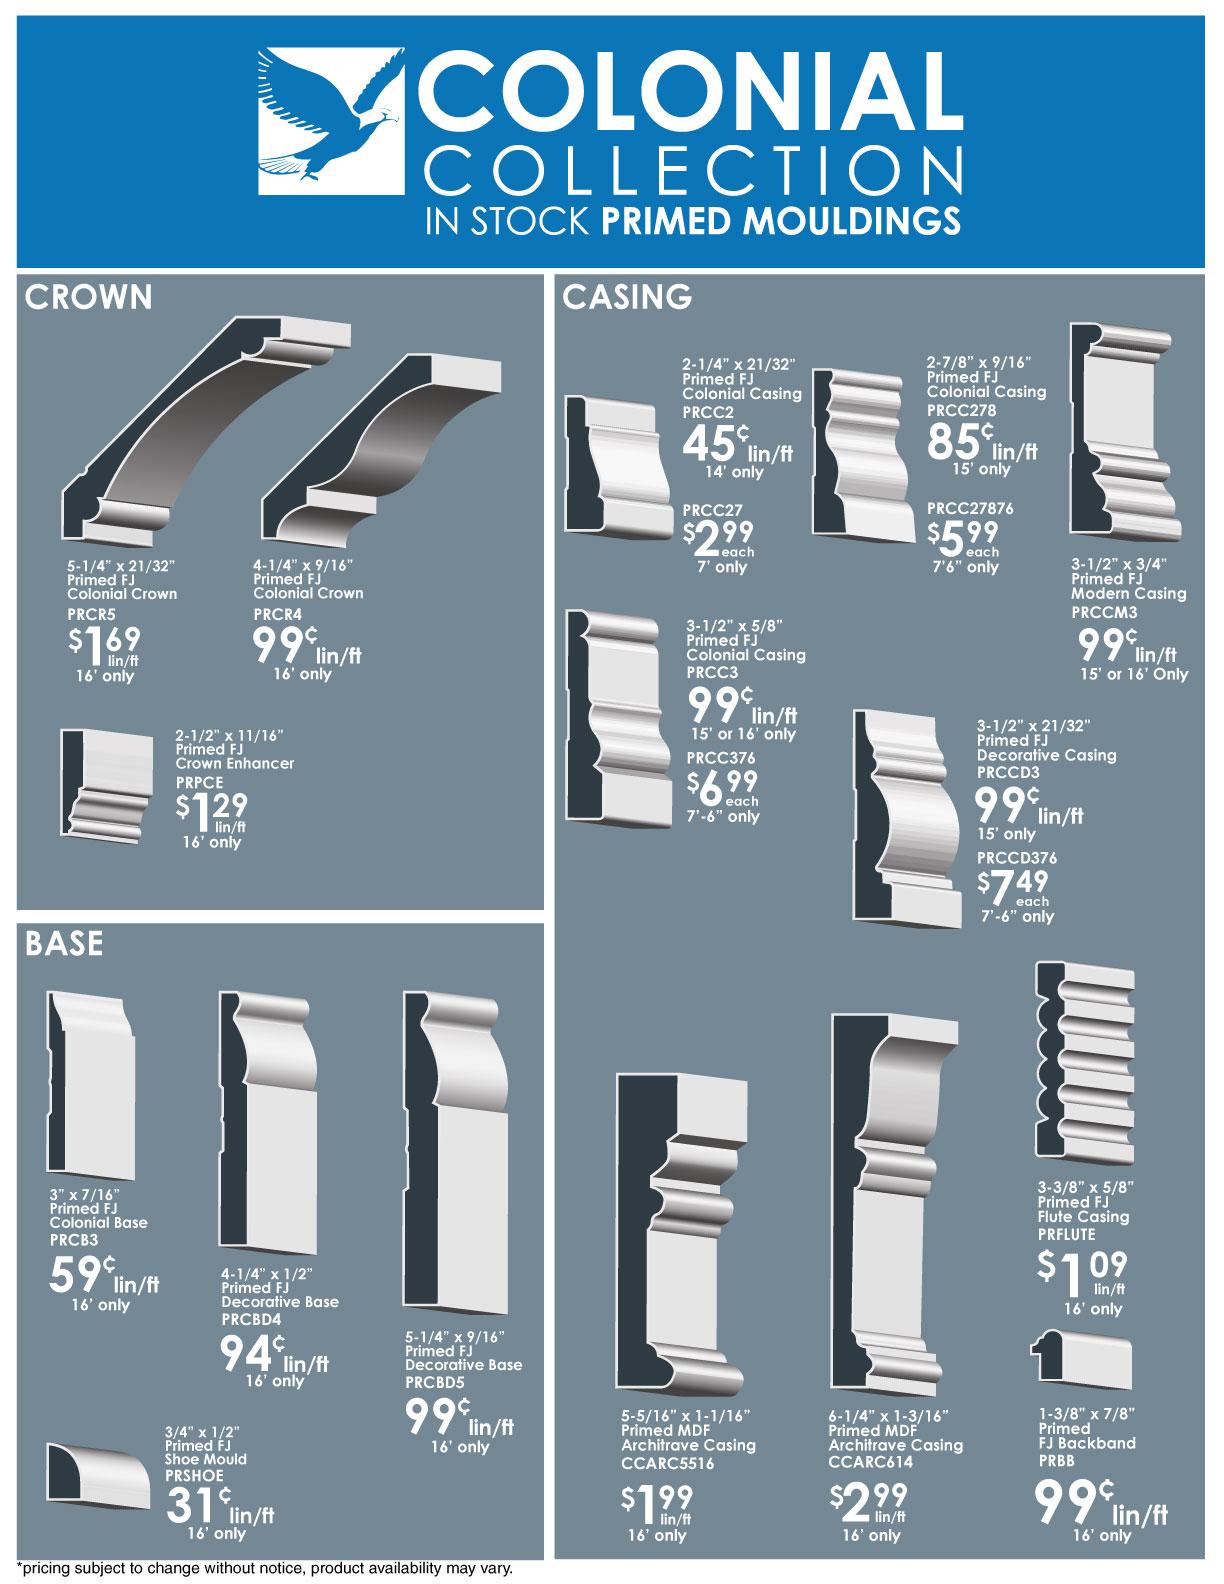 Mouldings-Hot-List-Brochure_colonial-1